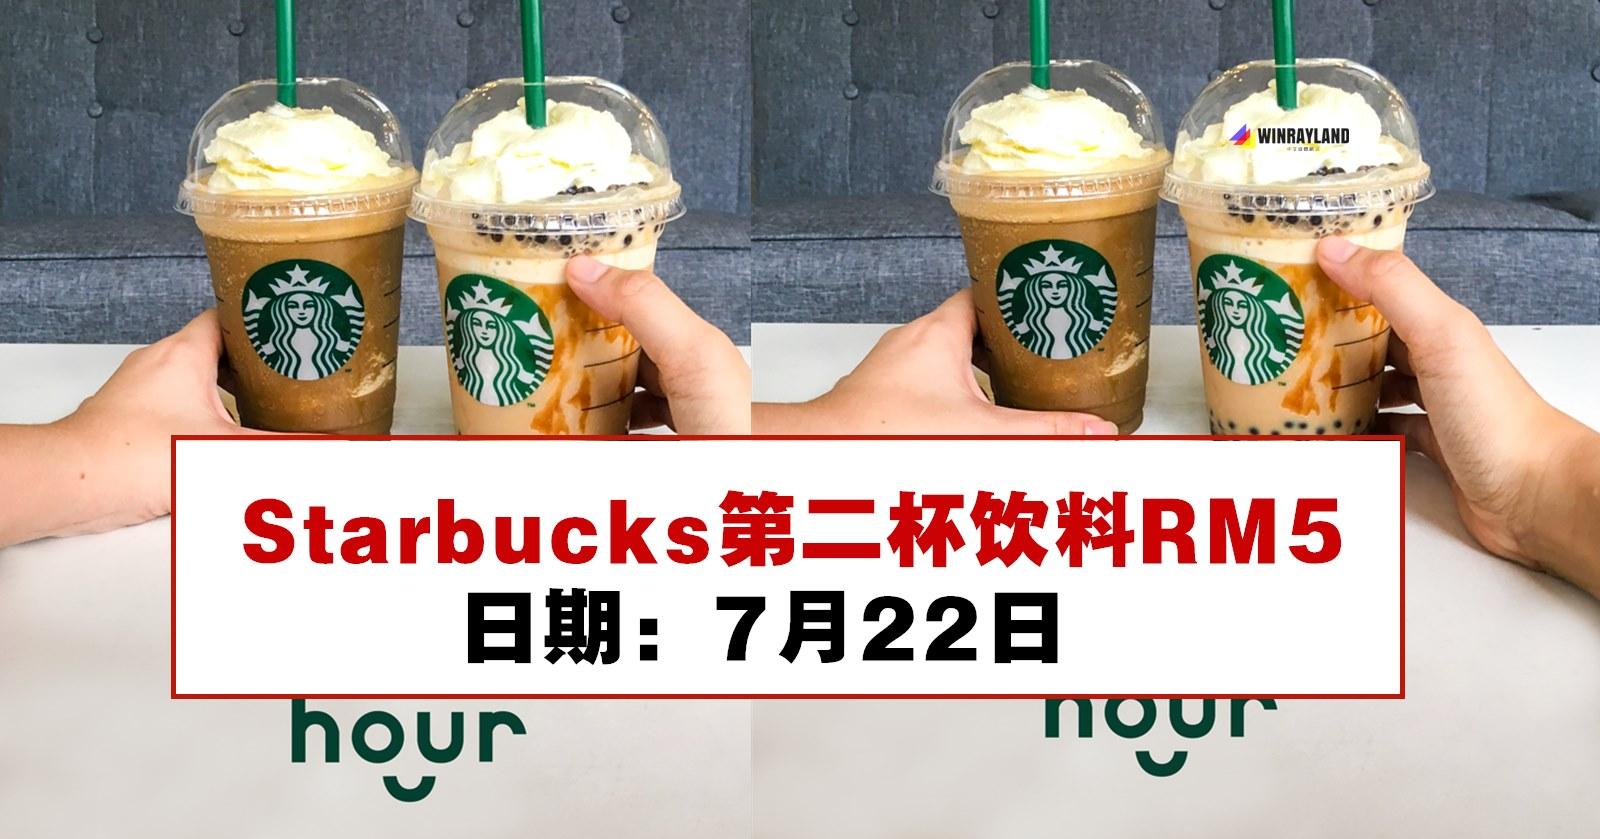 Starbucks第二杯饮料RM5